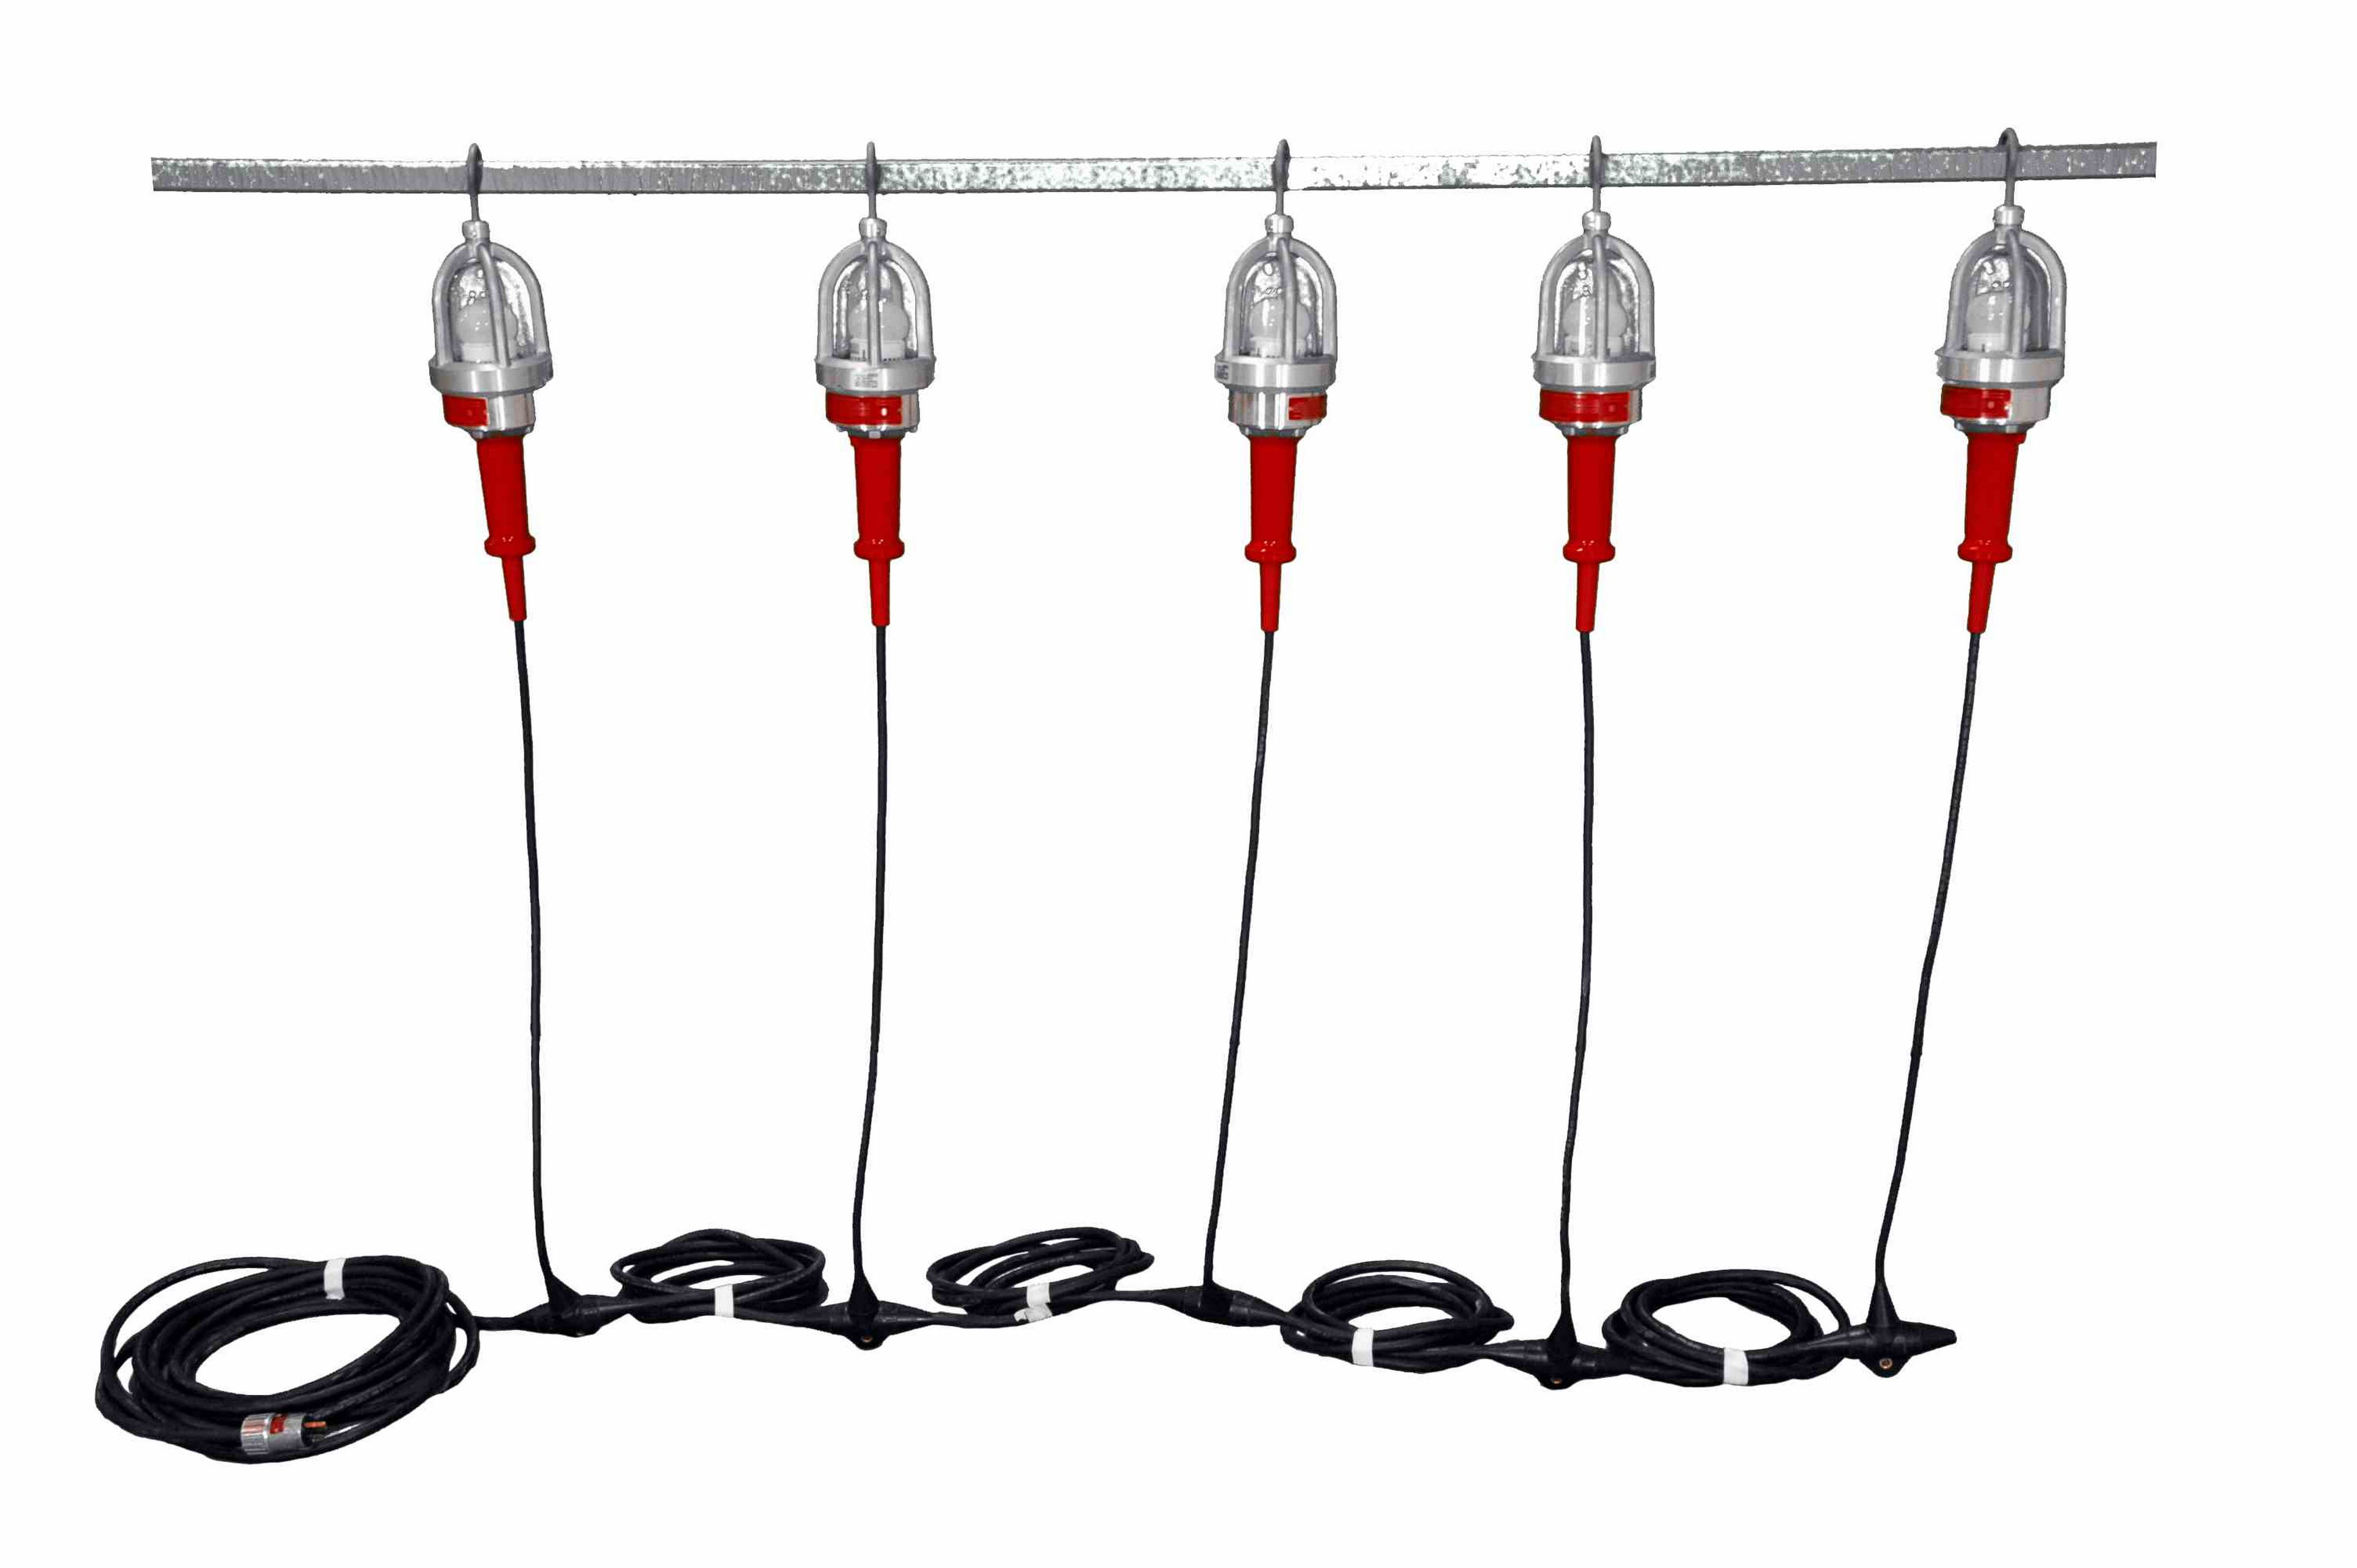 100 Ft Explosion Proof String Lights